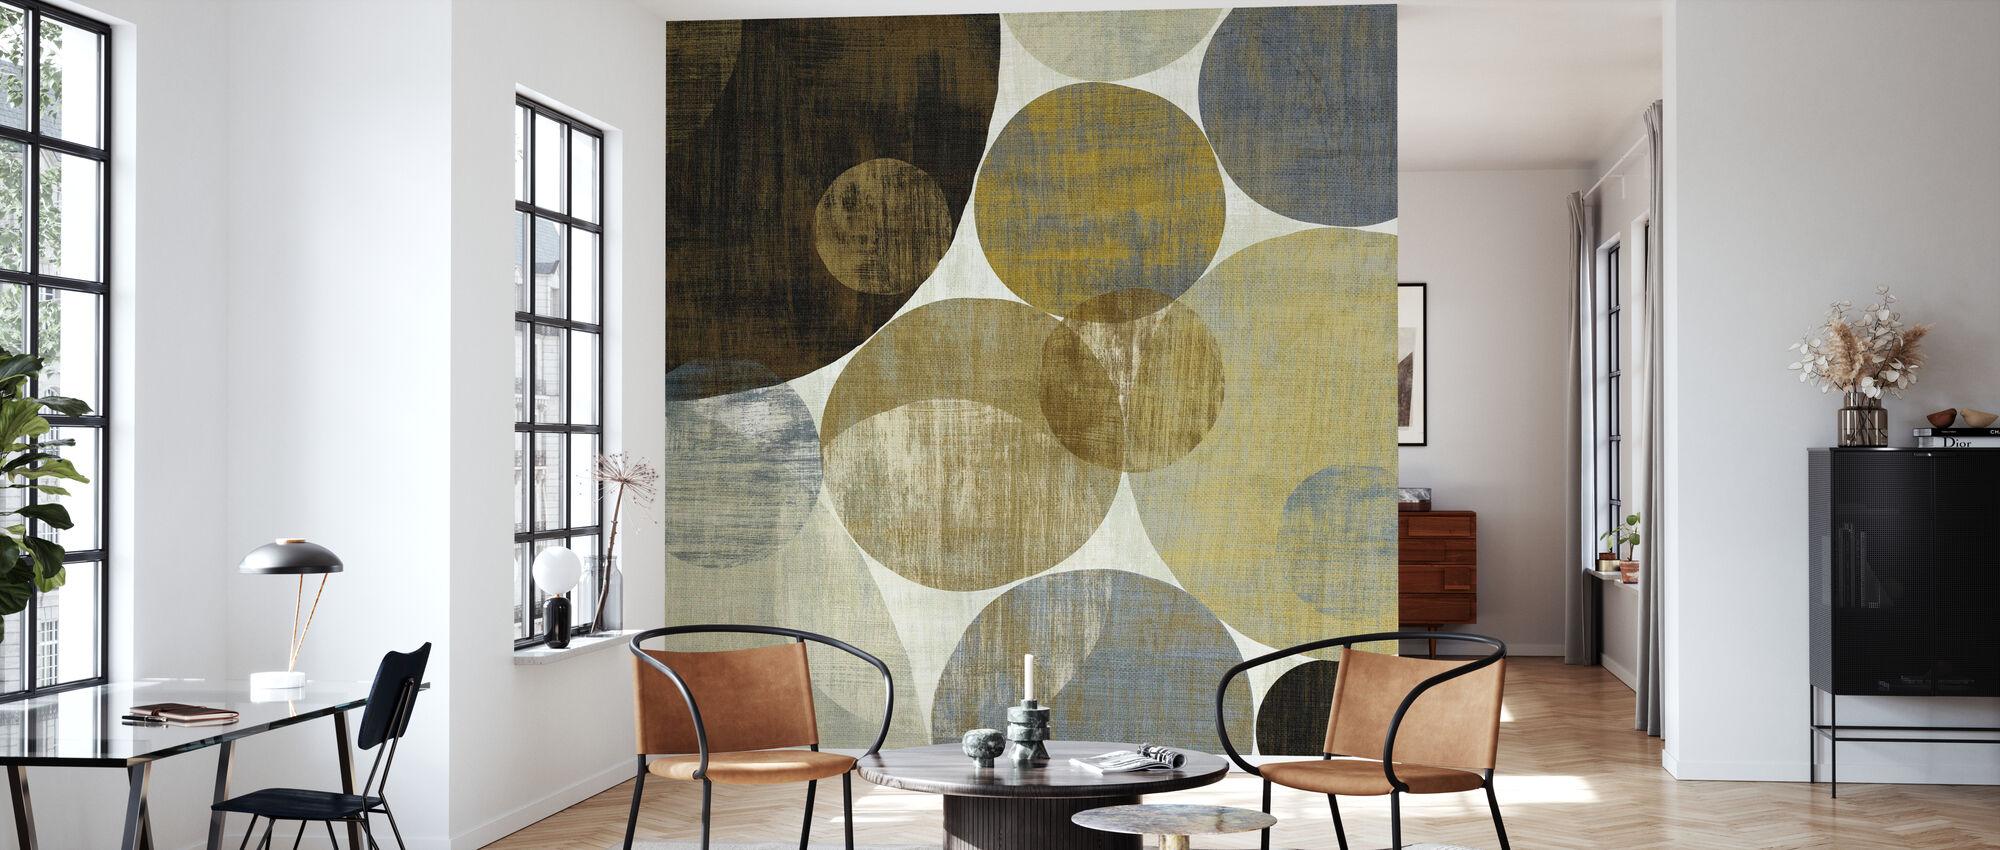 Circulation II - Wallpaper - Living Room